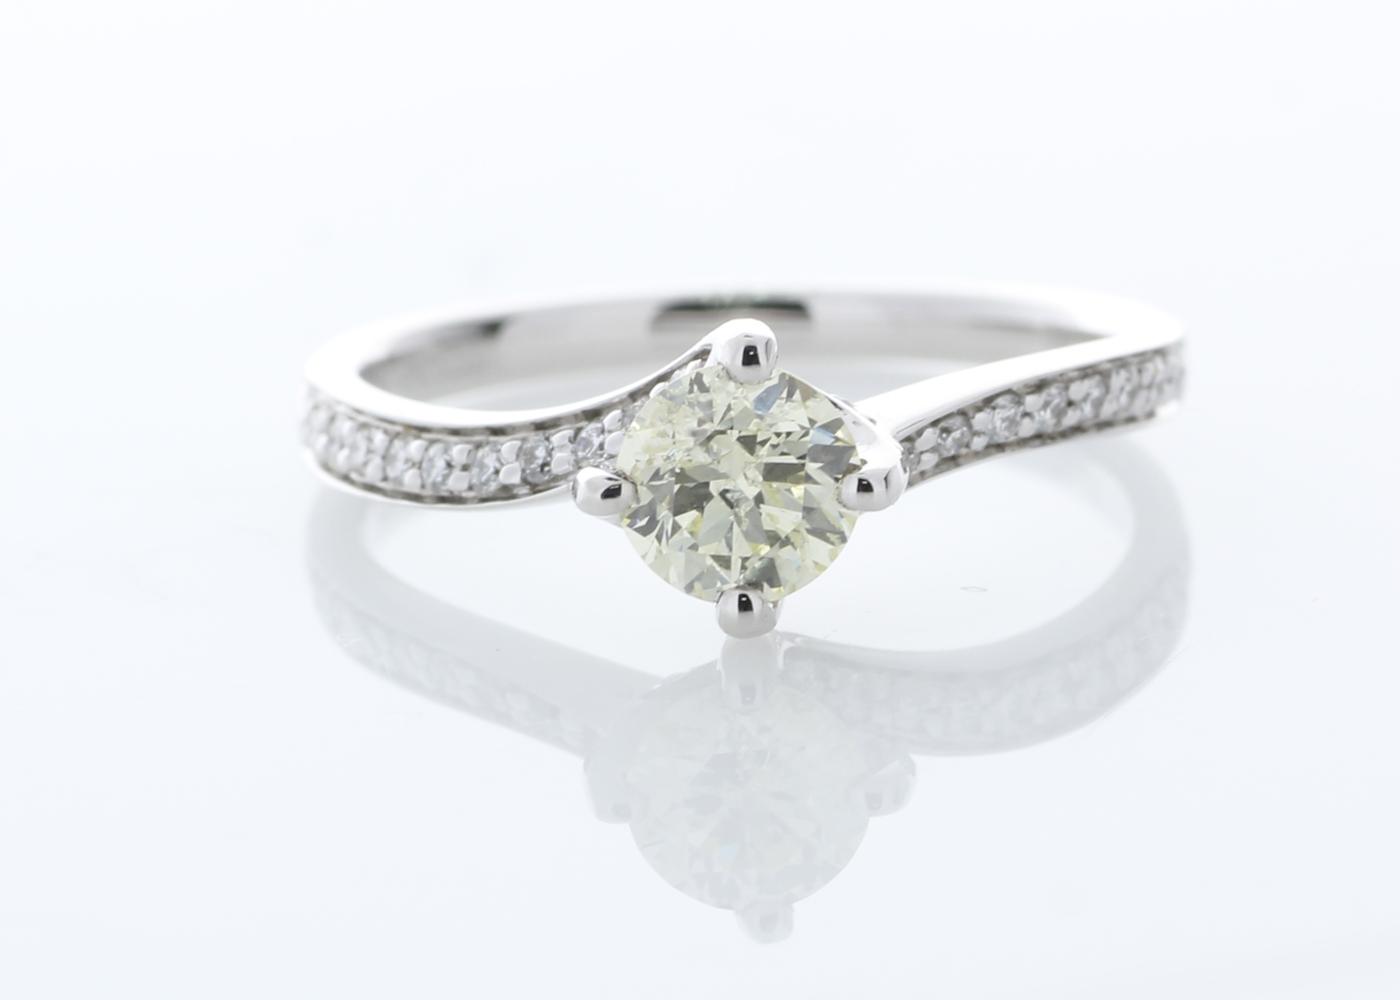 Lot 25 - 18k White Gold Single Stone with Diamond set Shoulders Ring 0.72